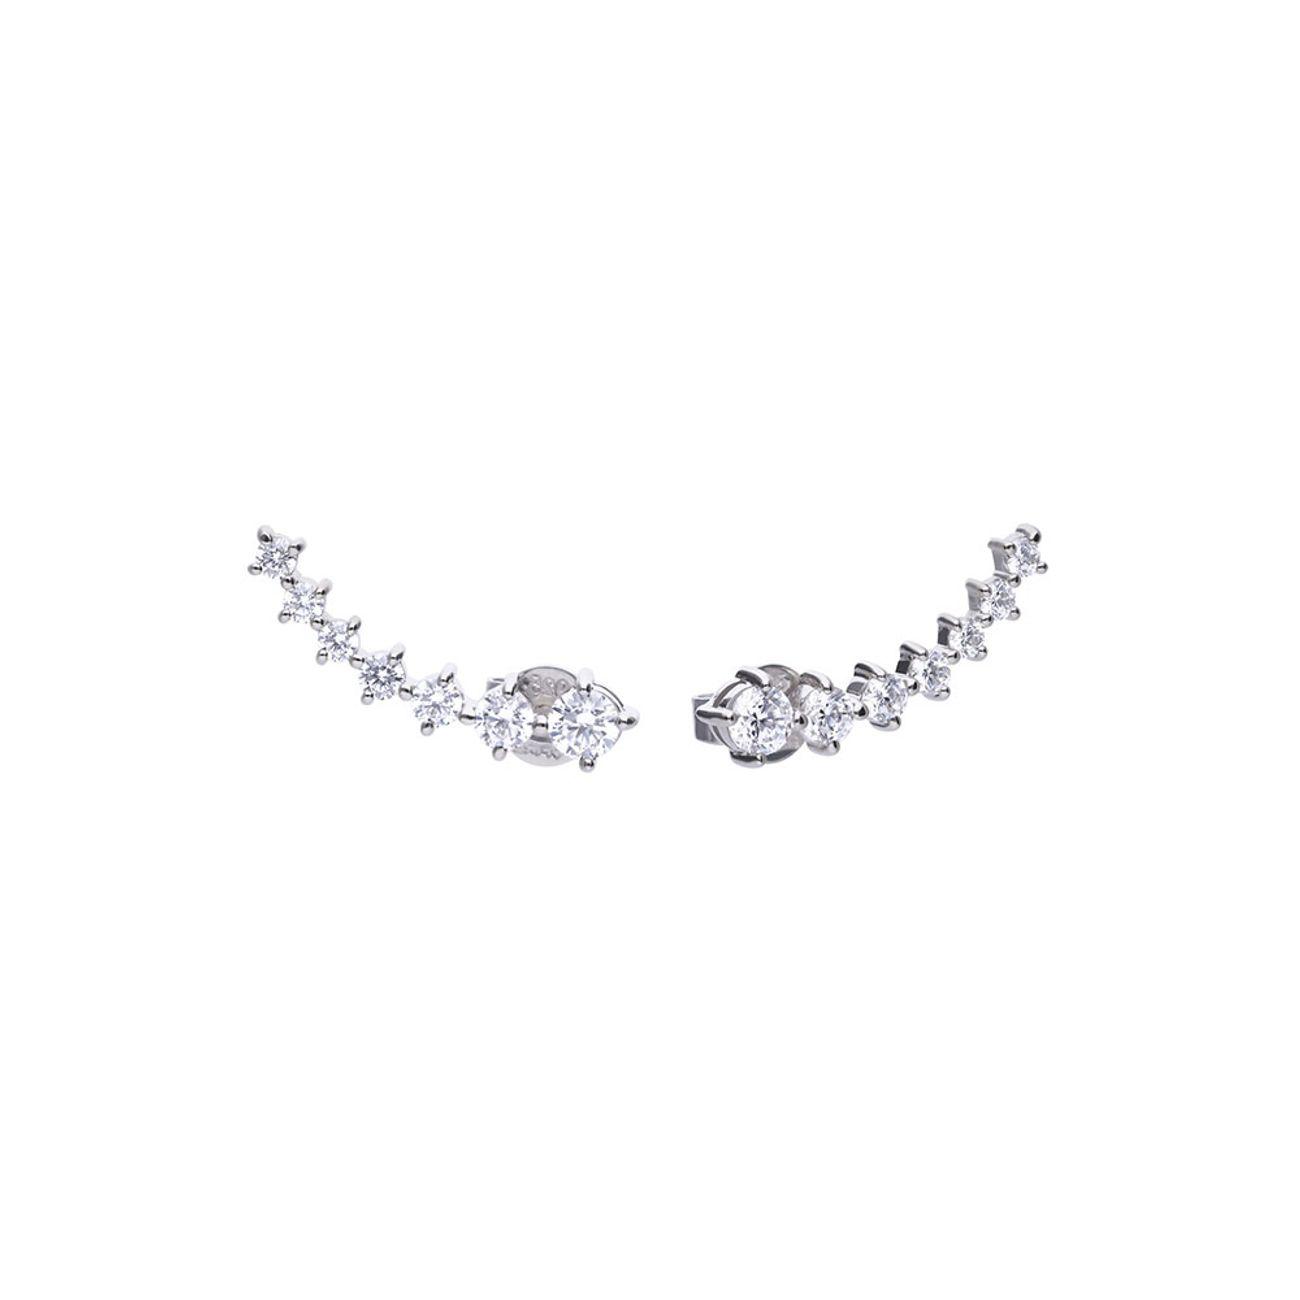 2a87a033987a Pendientes trepadores de plata Brilliant 6218111082 - Style Watch